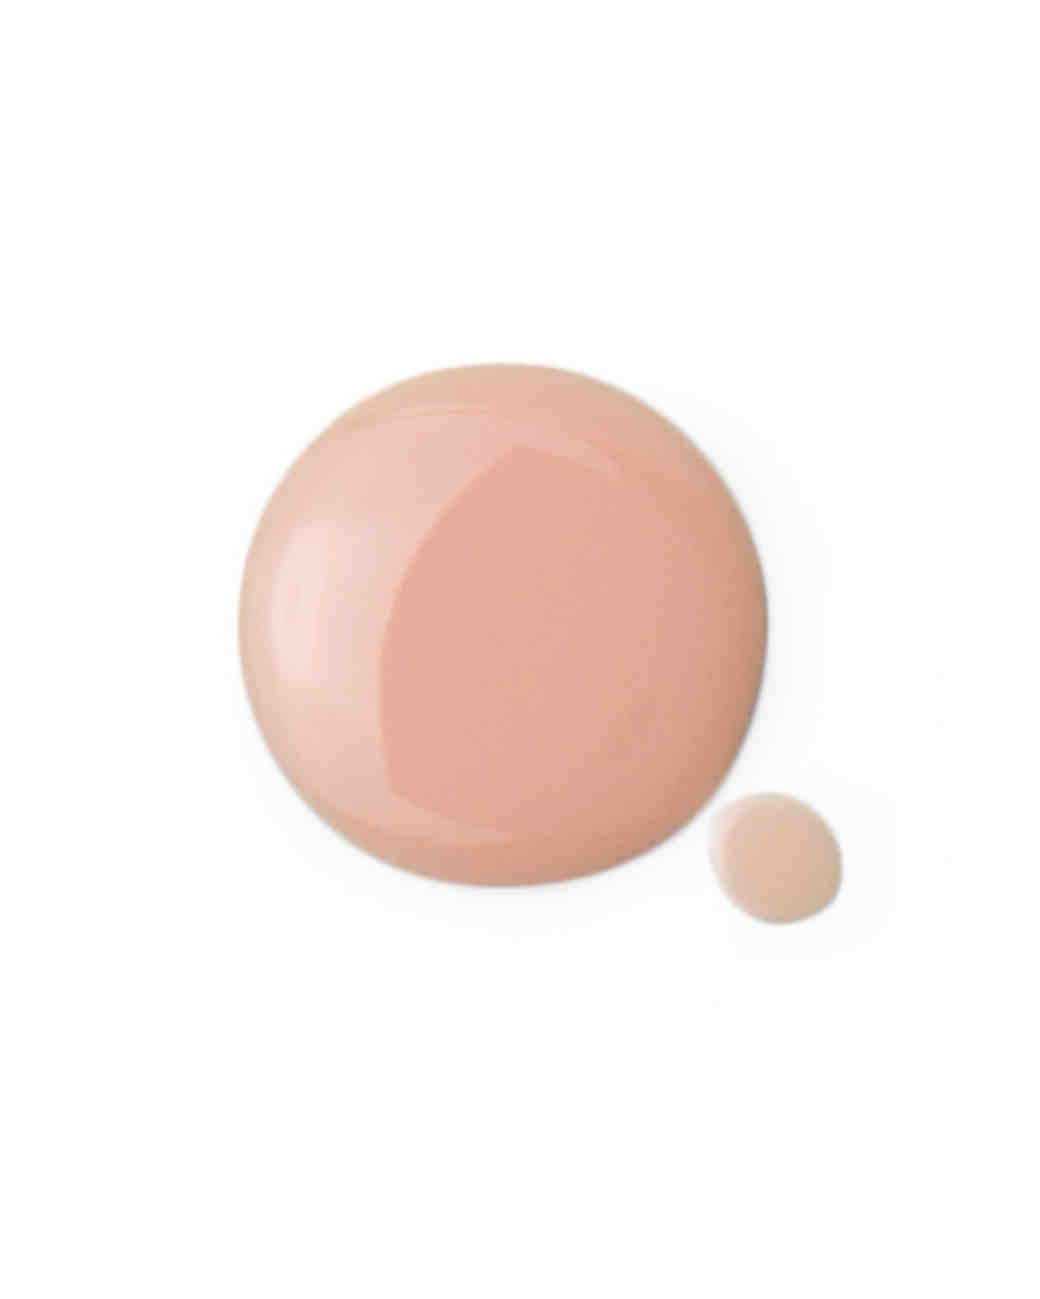 nail-polish-002-mwd109767.jpg